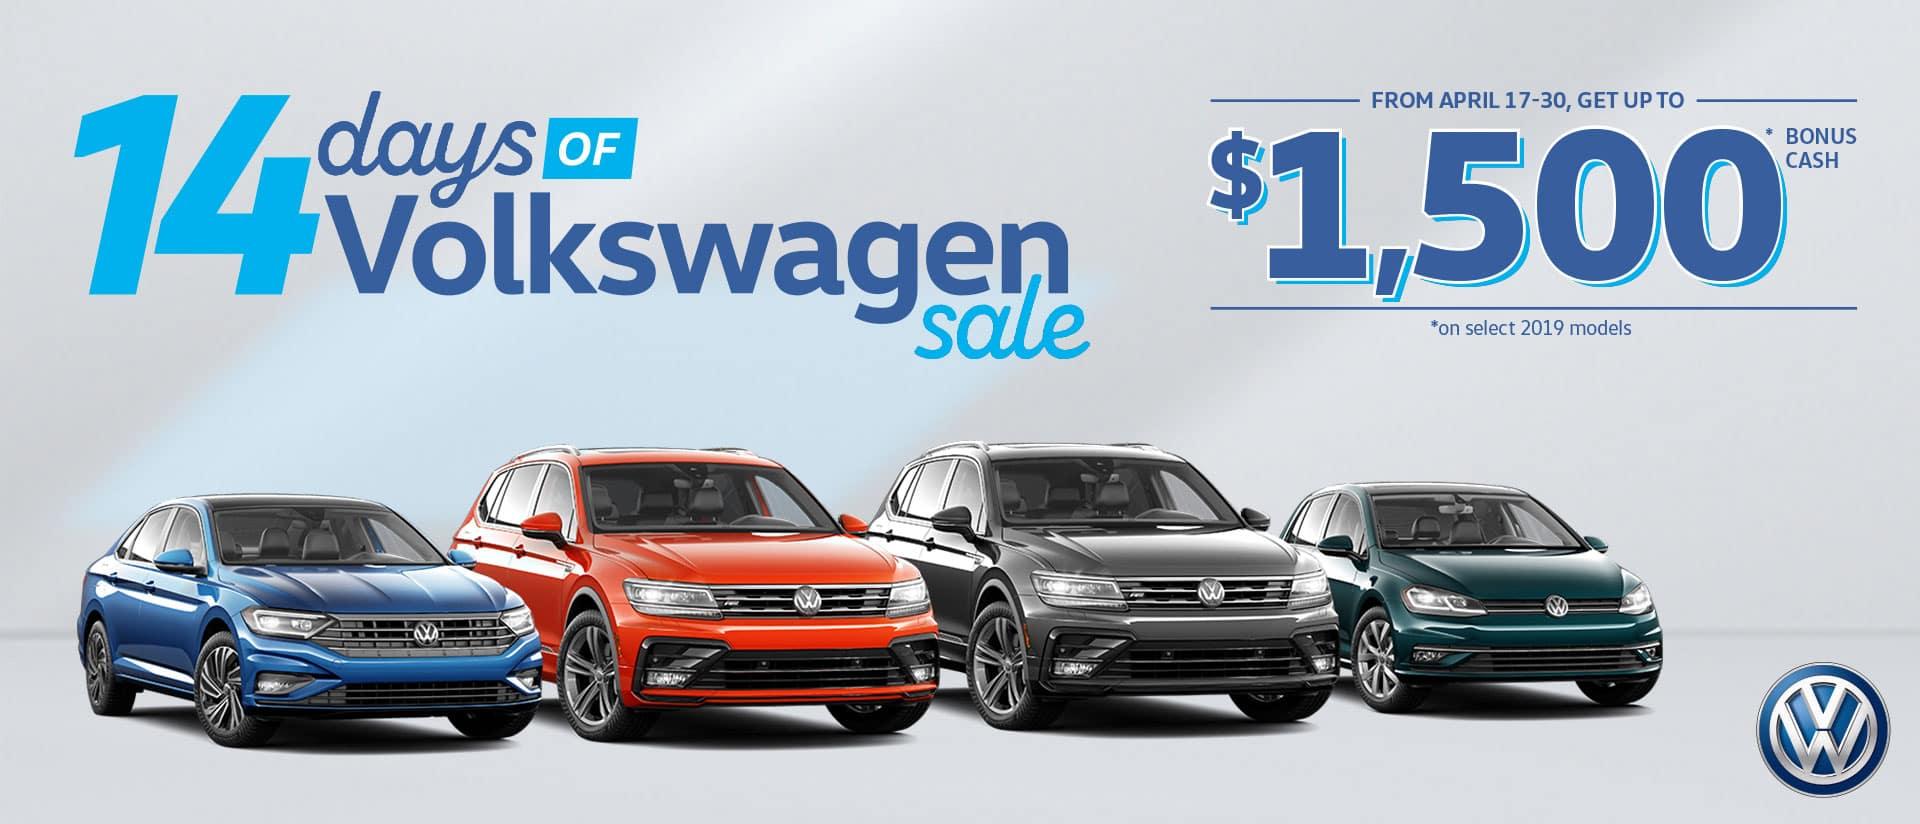 The 14 Days of Volkswagen Event is on now at Maple Ridge Volkswagen!